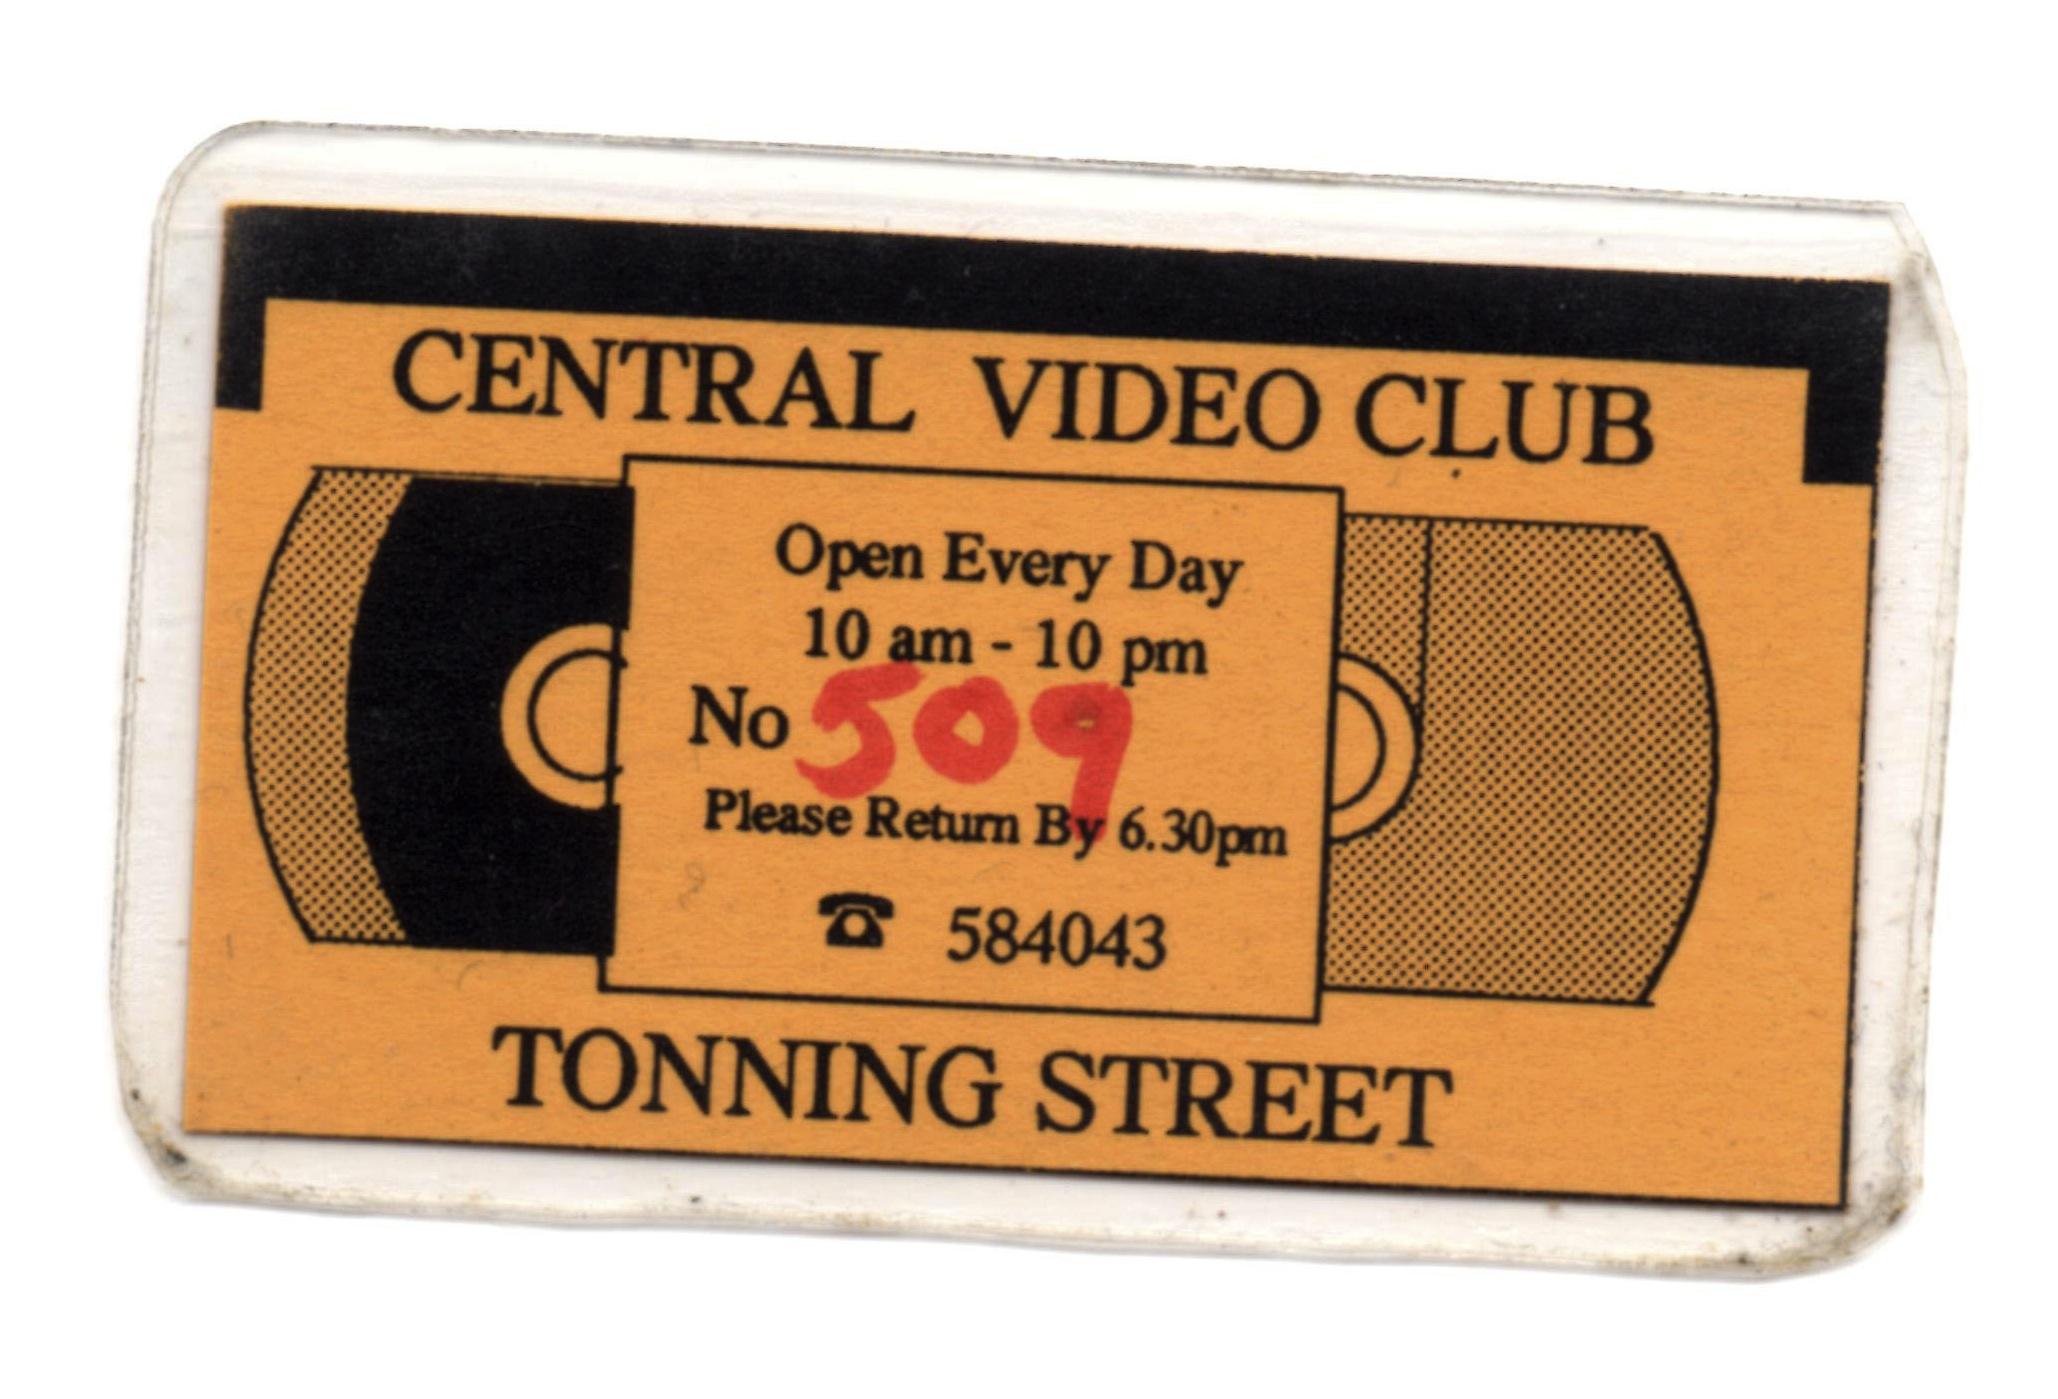 Membership cards copy 4